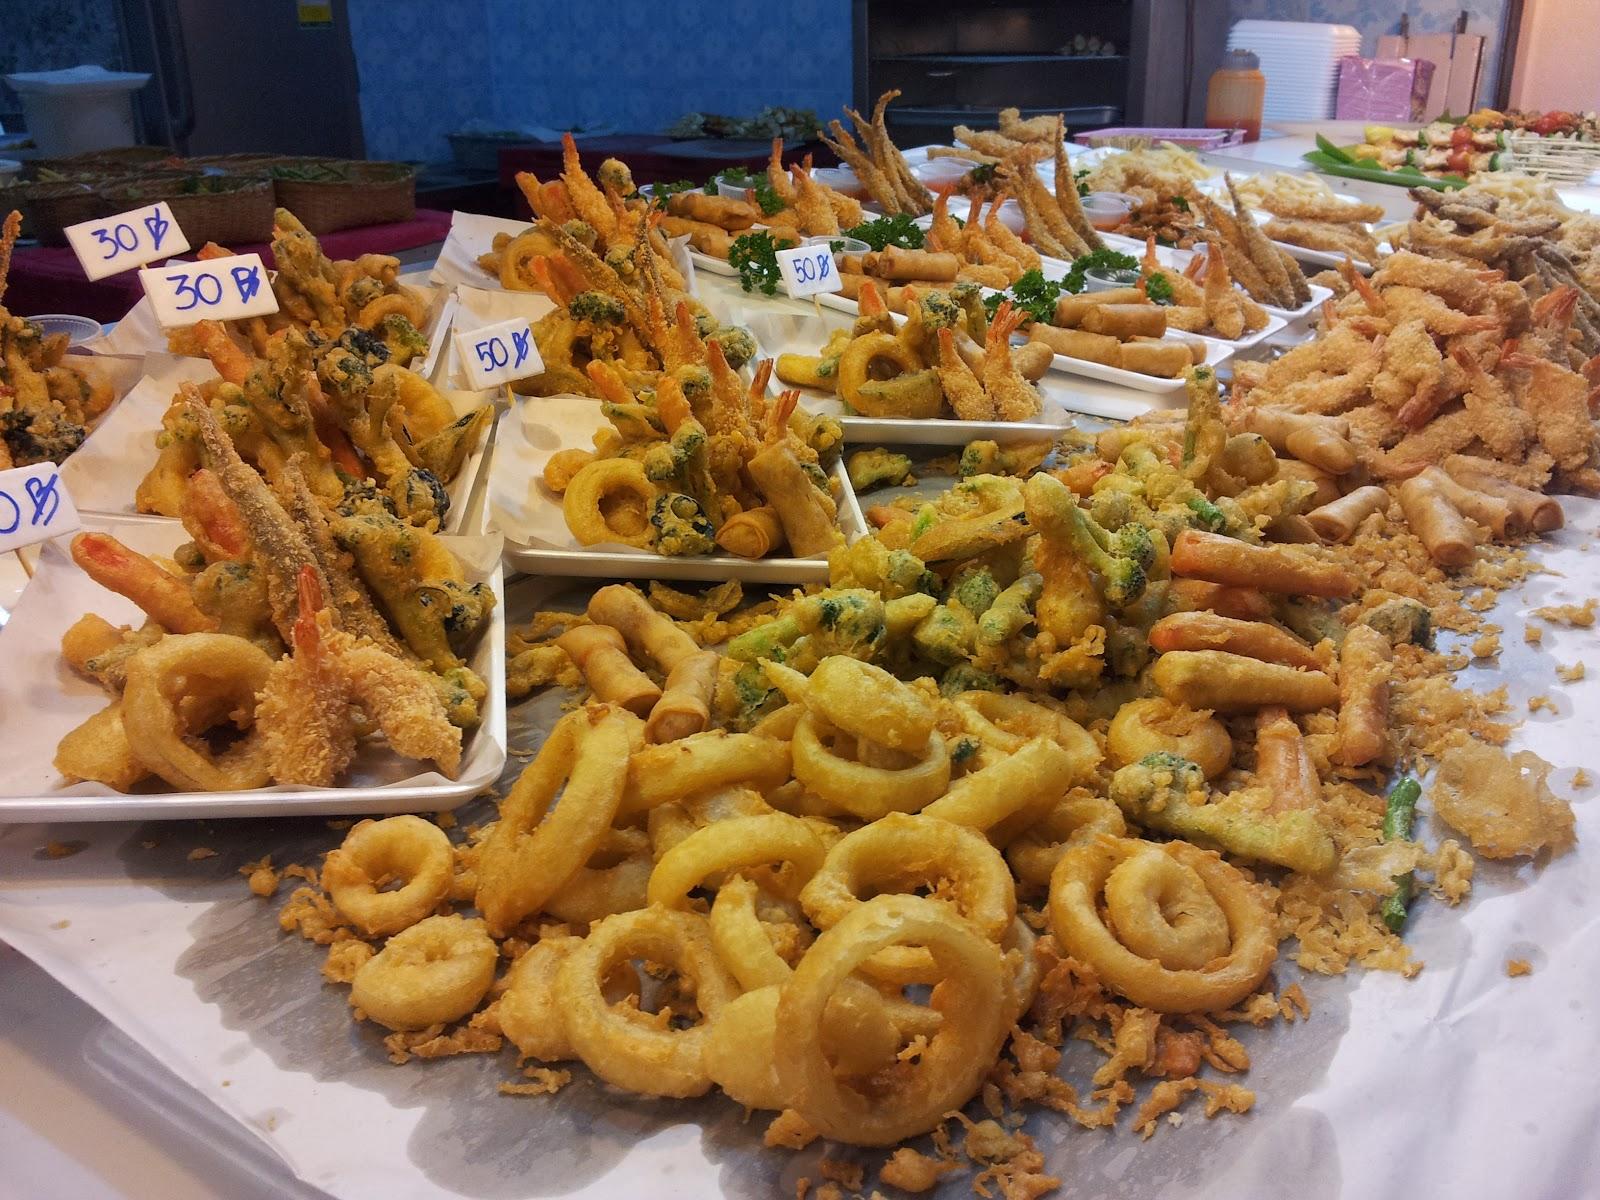 2 tarins australiens tha lande la cuisine tha landaise for Cuisine thailandaise